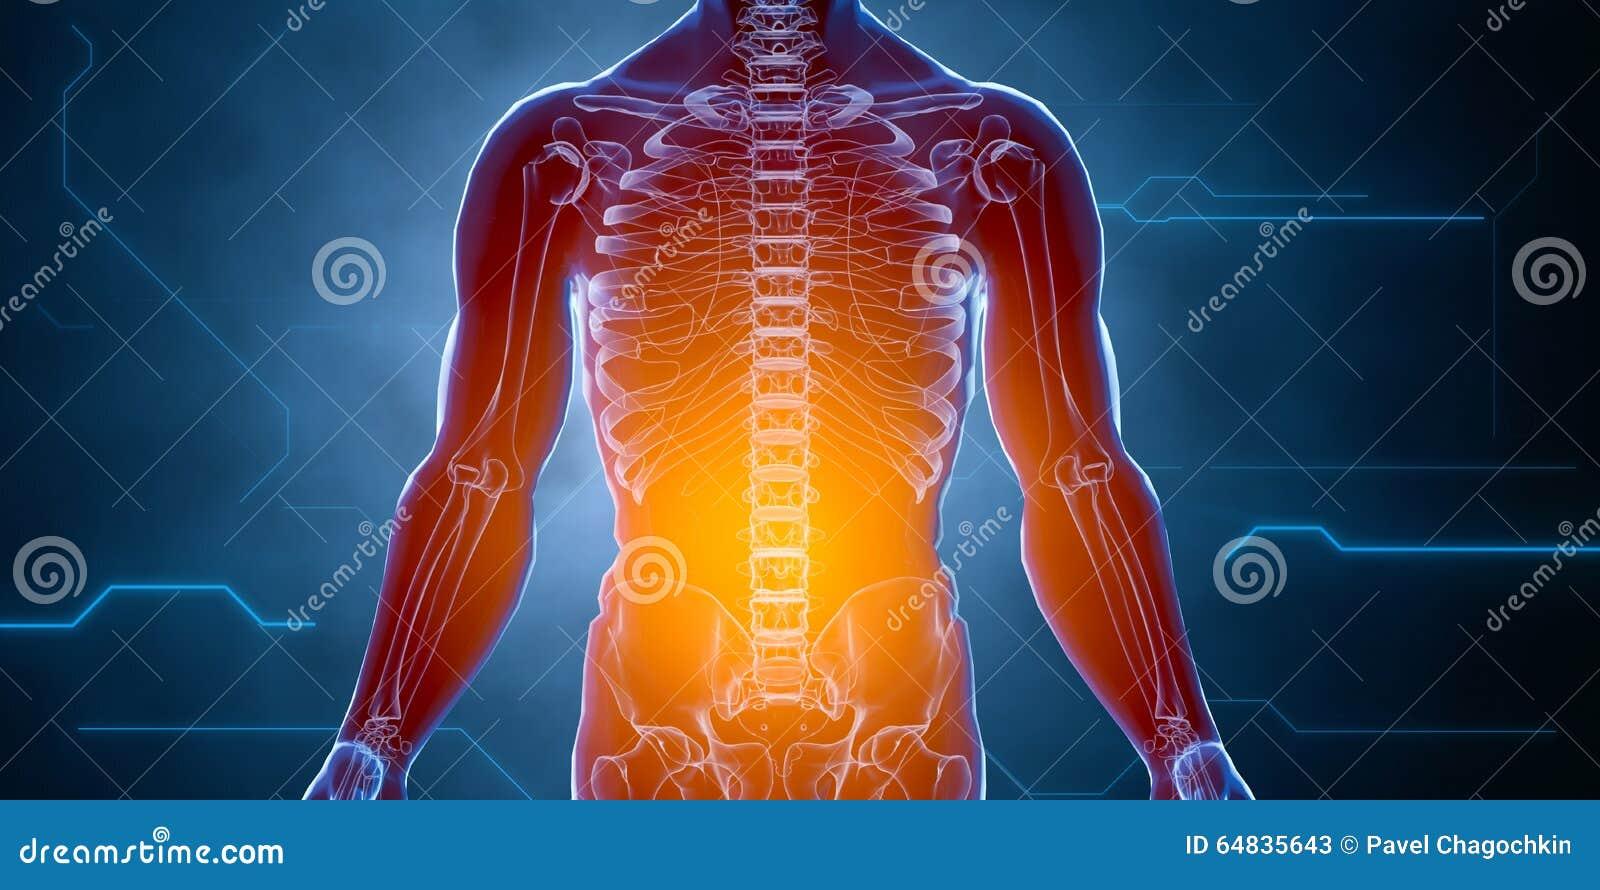 Contemporáneo Anatomía Cateterismo Hembra Composición - Anatomía de ...